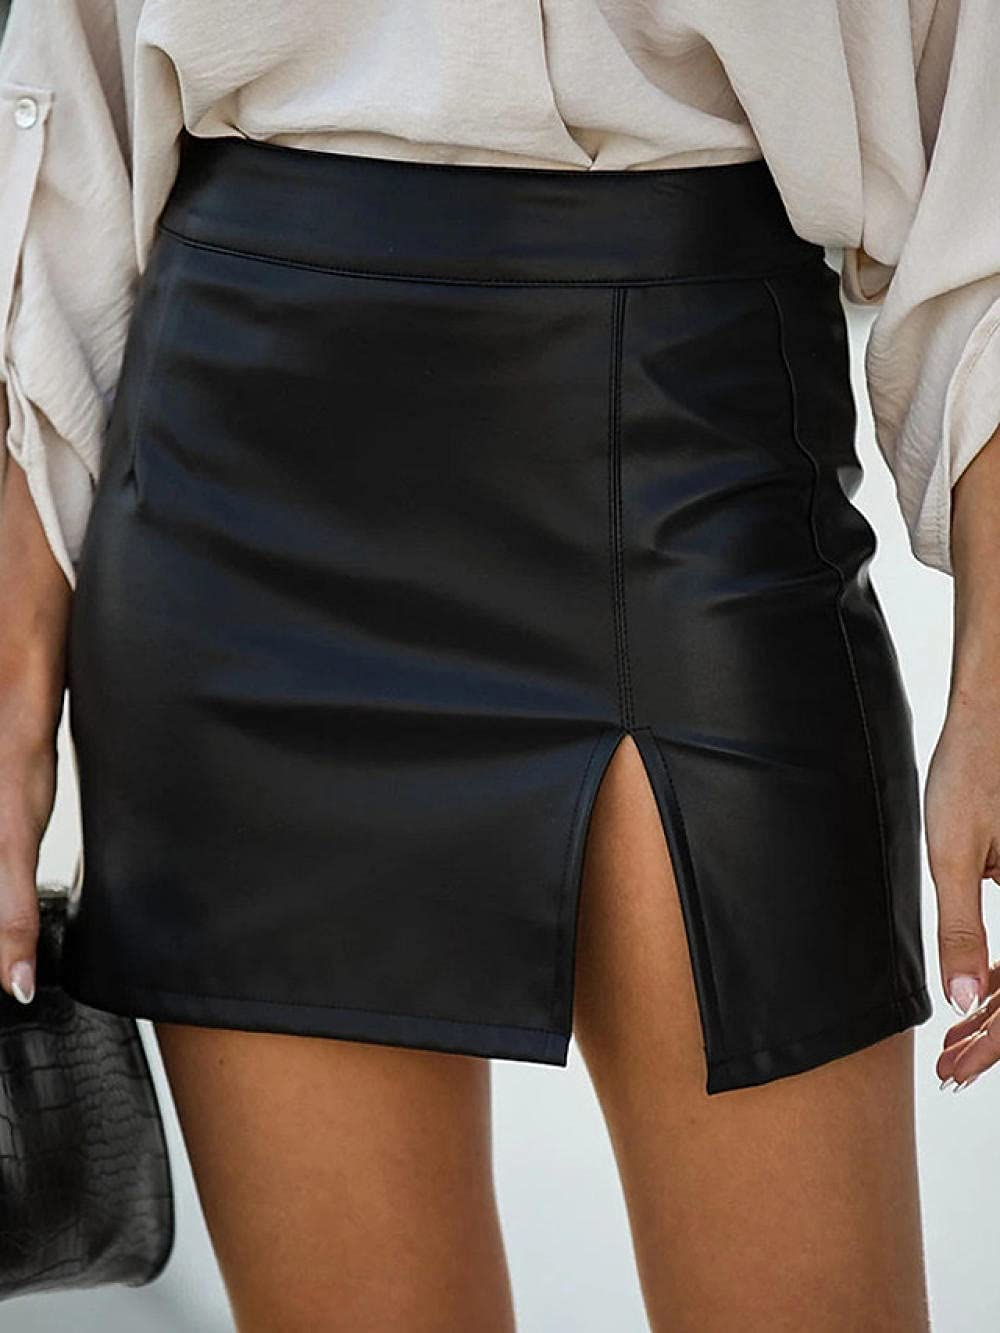 FWJSDPZ Fashionable Everyday Wear Tight Skirt Solid Color Split Black/Mini Skirt (Color : Black, Size : Small)